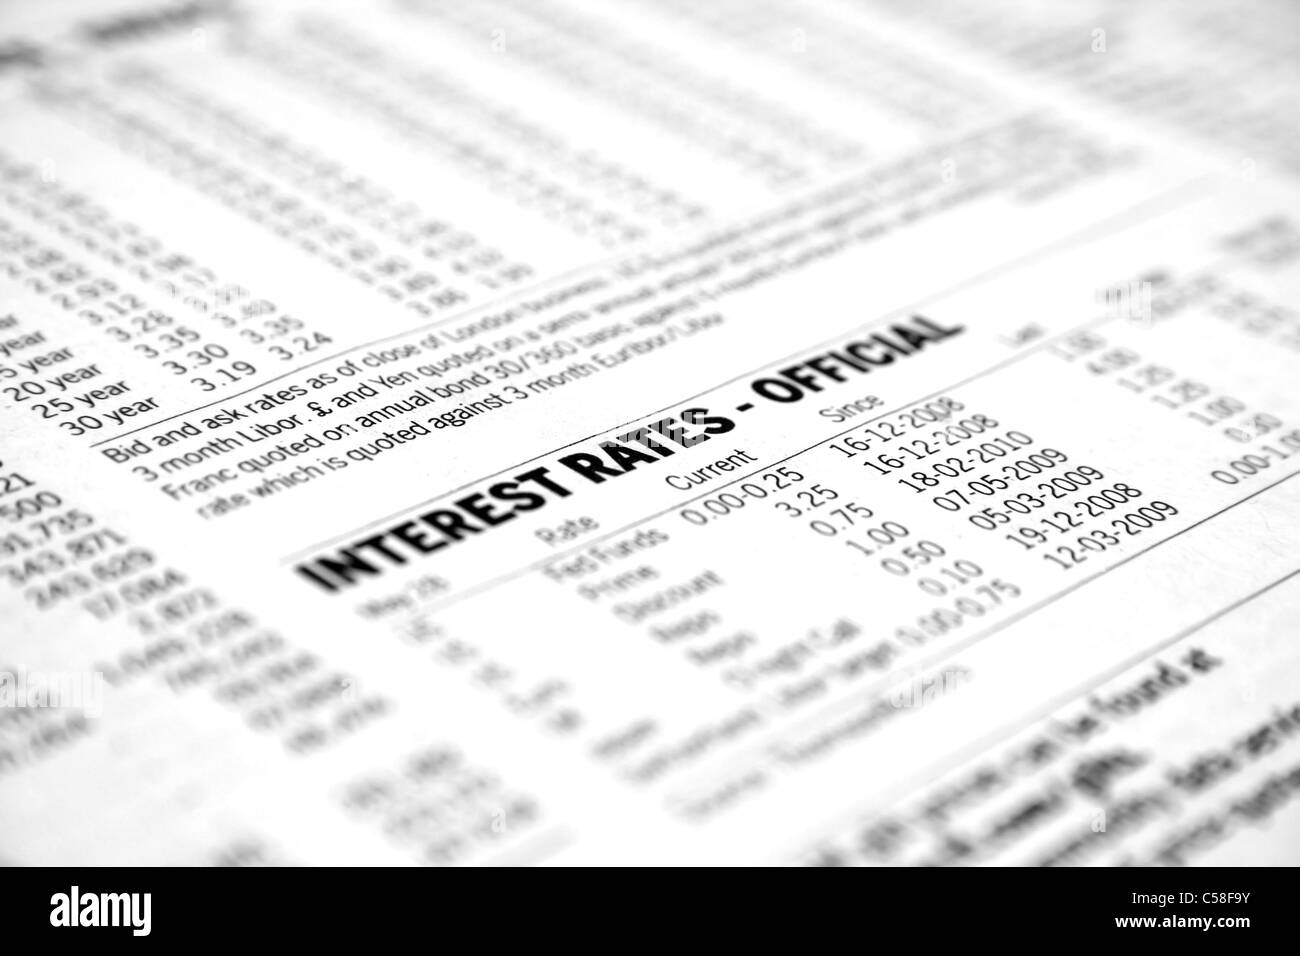 Interest rates - Stock Image